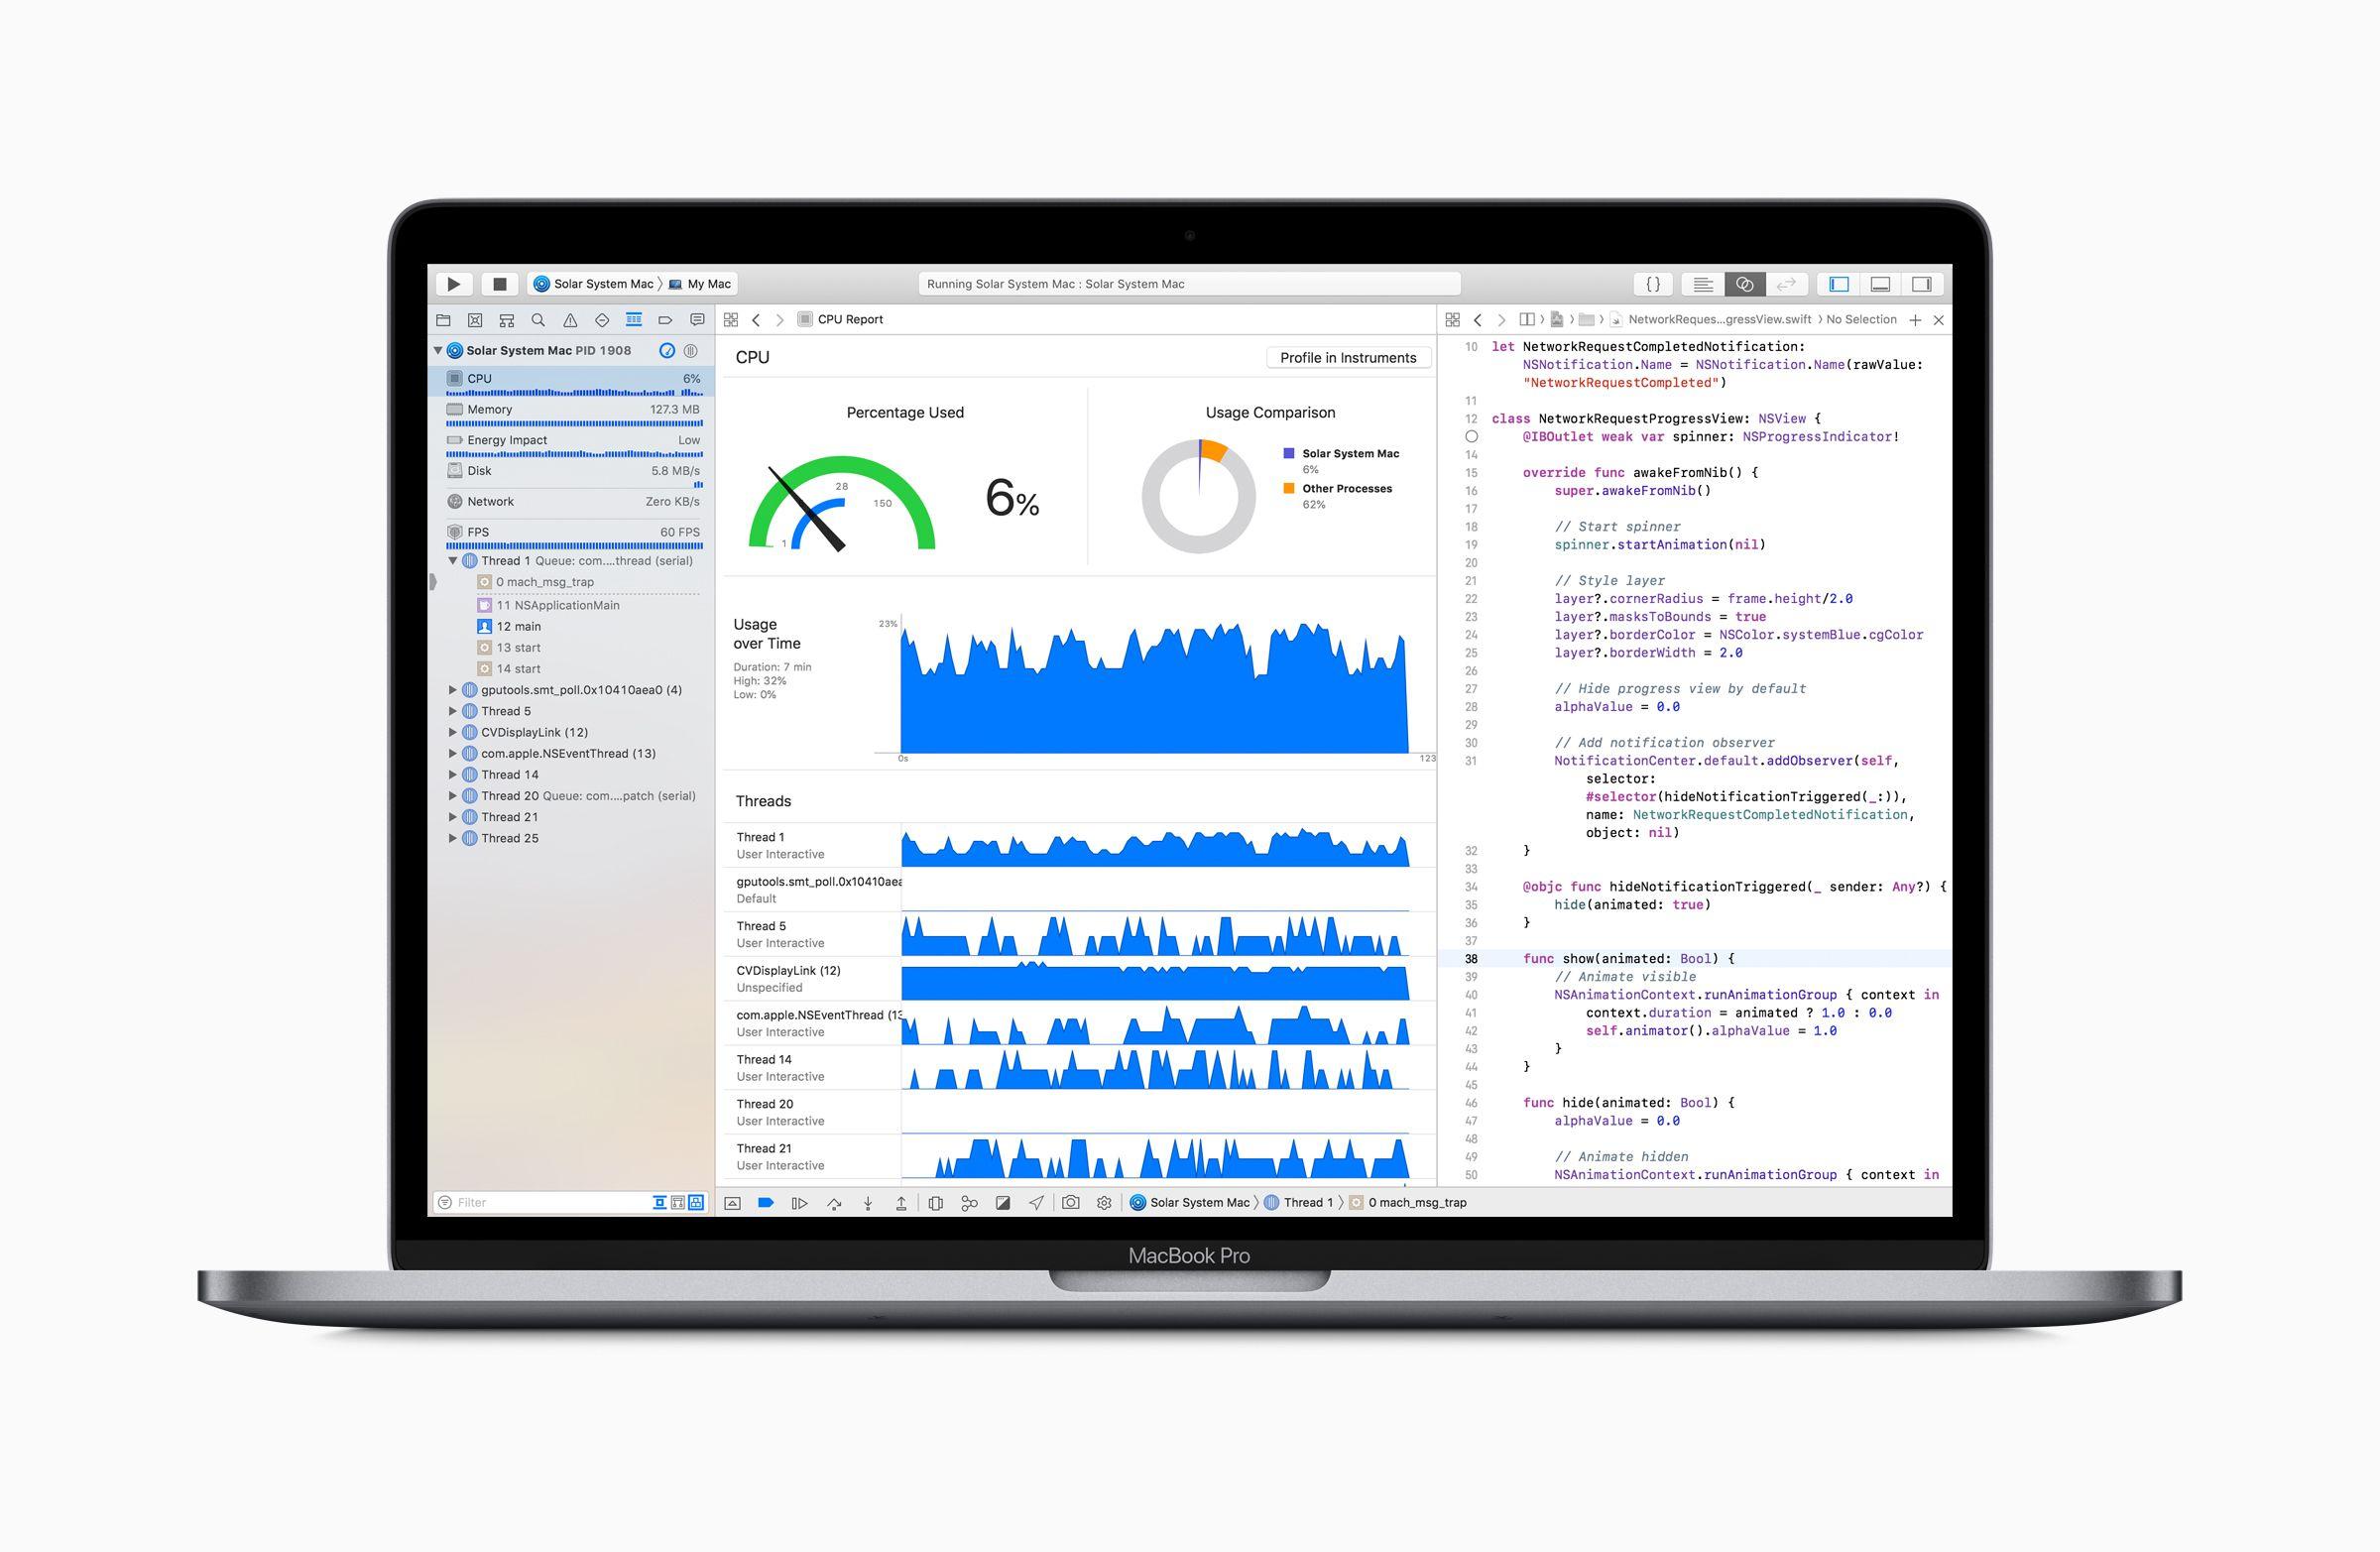 MacBook Pro 2018 coding